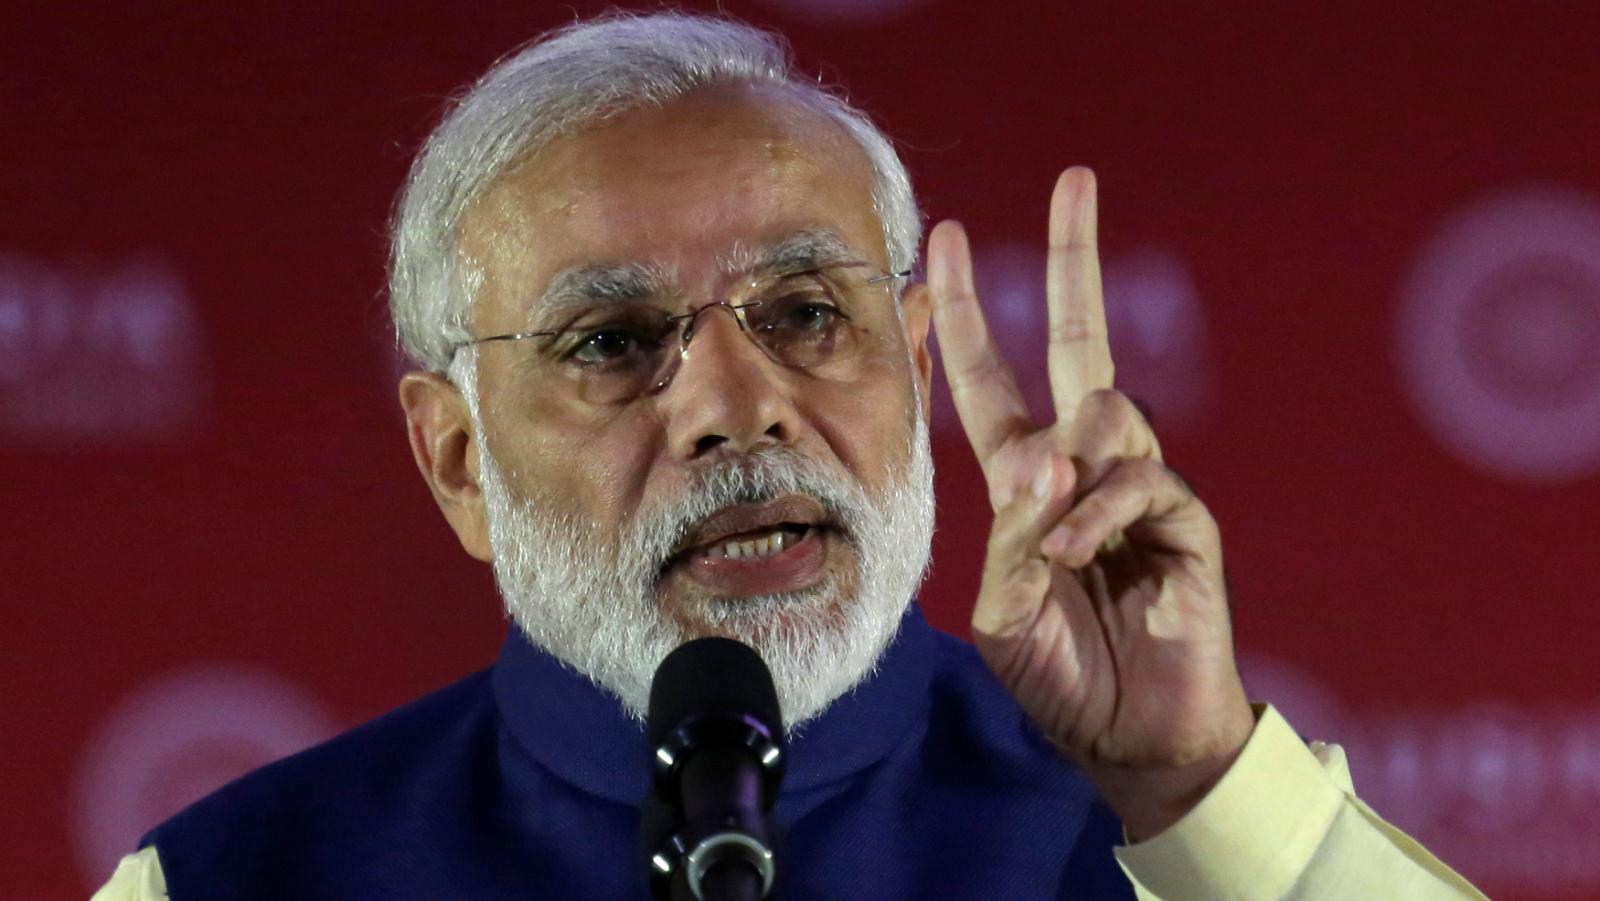 ndia's Prime Minister Narendra Modi speaks at the U.S.-India Business Council (USIBC) 41st annual Leadership Summit in Washington, U.S., June 7, 2016. REUTERS/Yuri Gripas